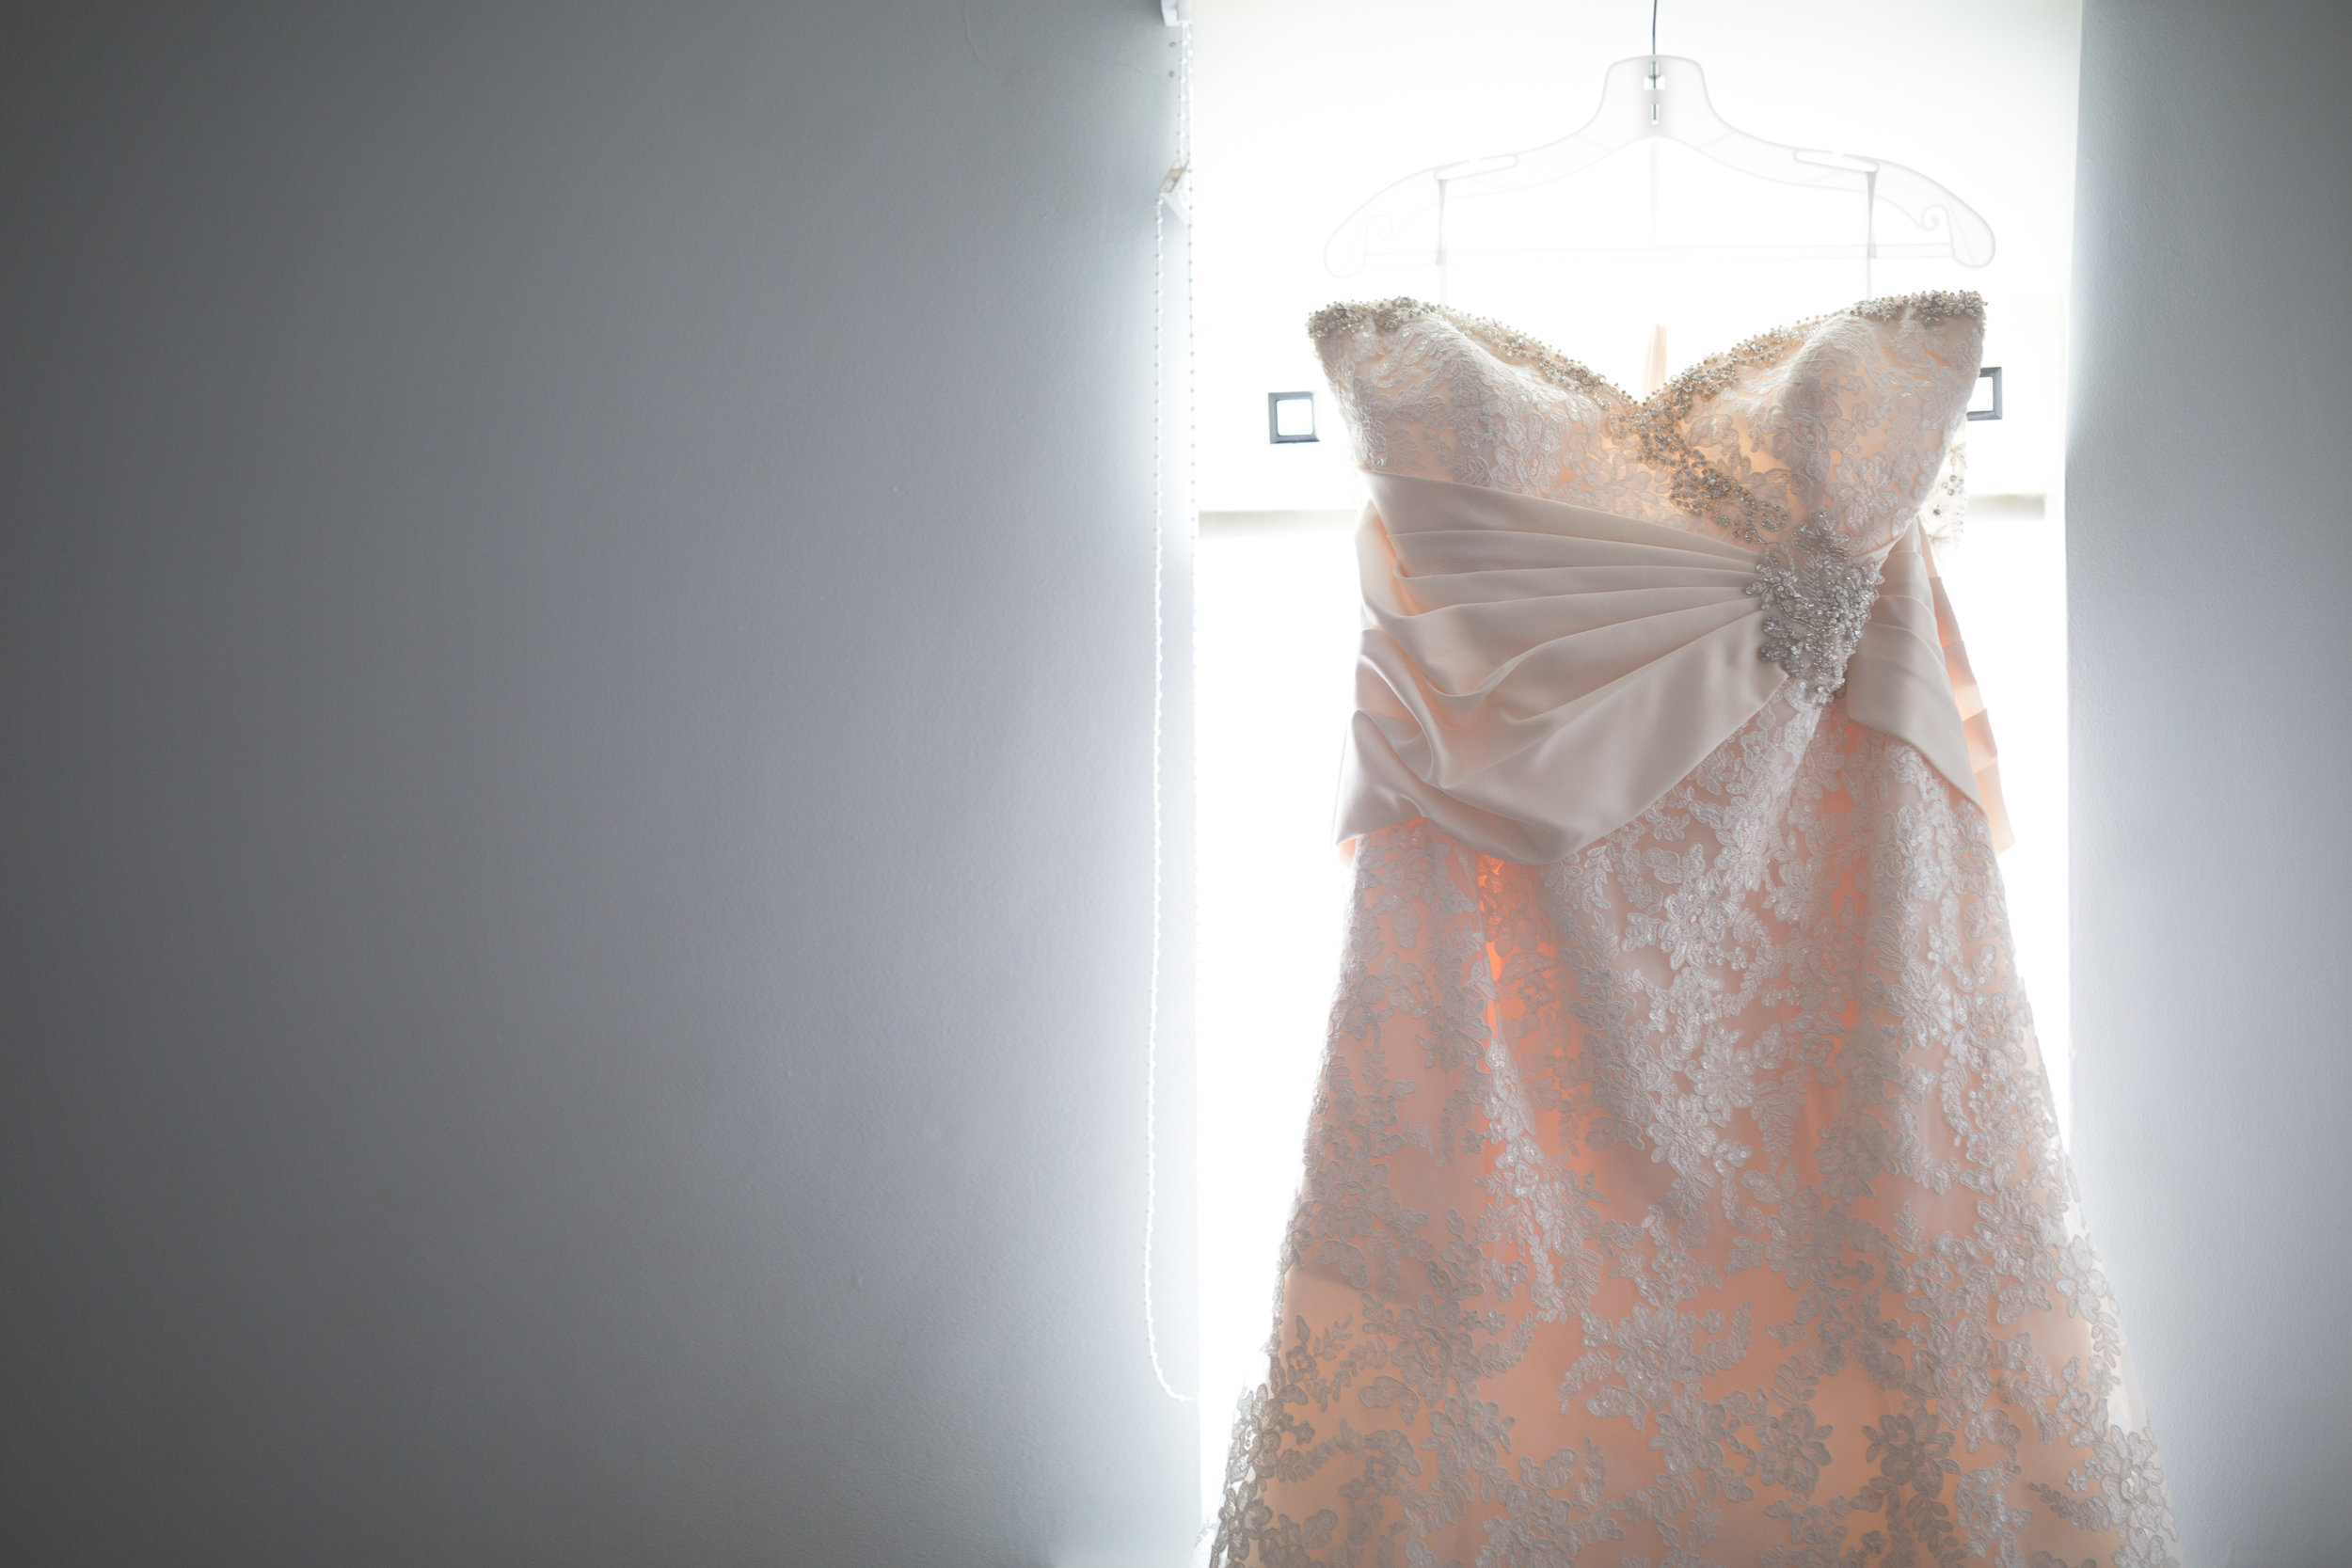 Antoinette & Stephen - Bridal Preparations | Brian McEwan Photography | Wedding Photographer Northern Ireland 6.jpg